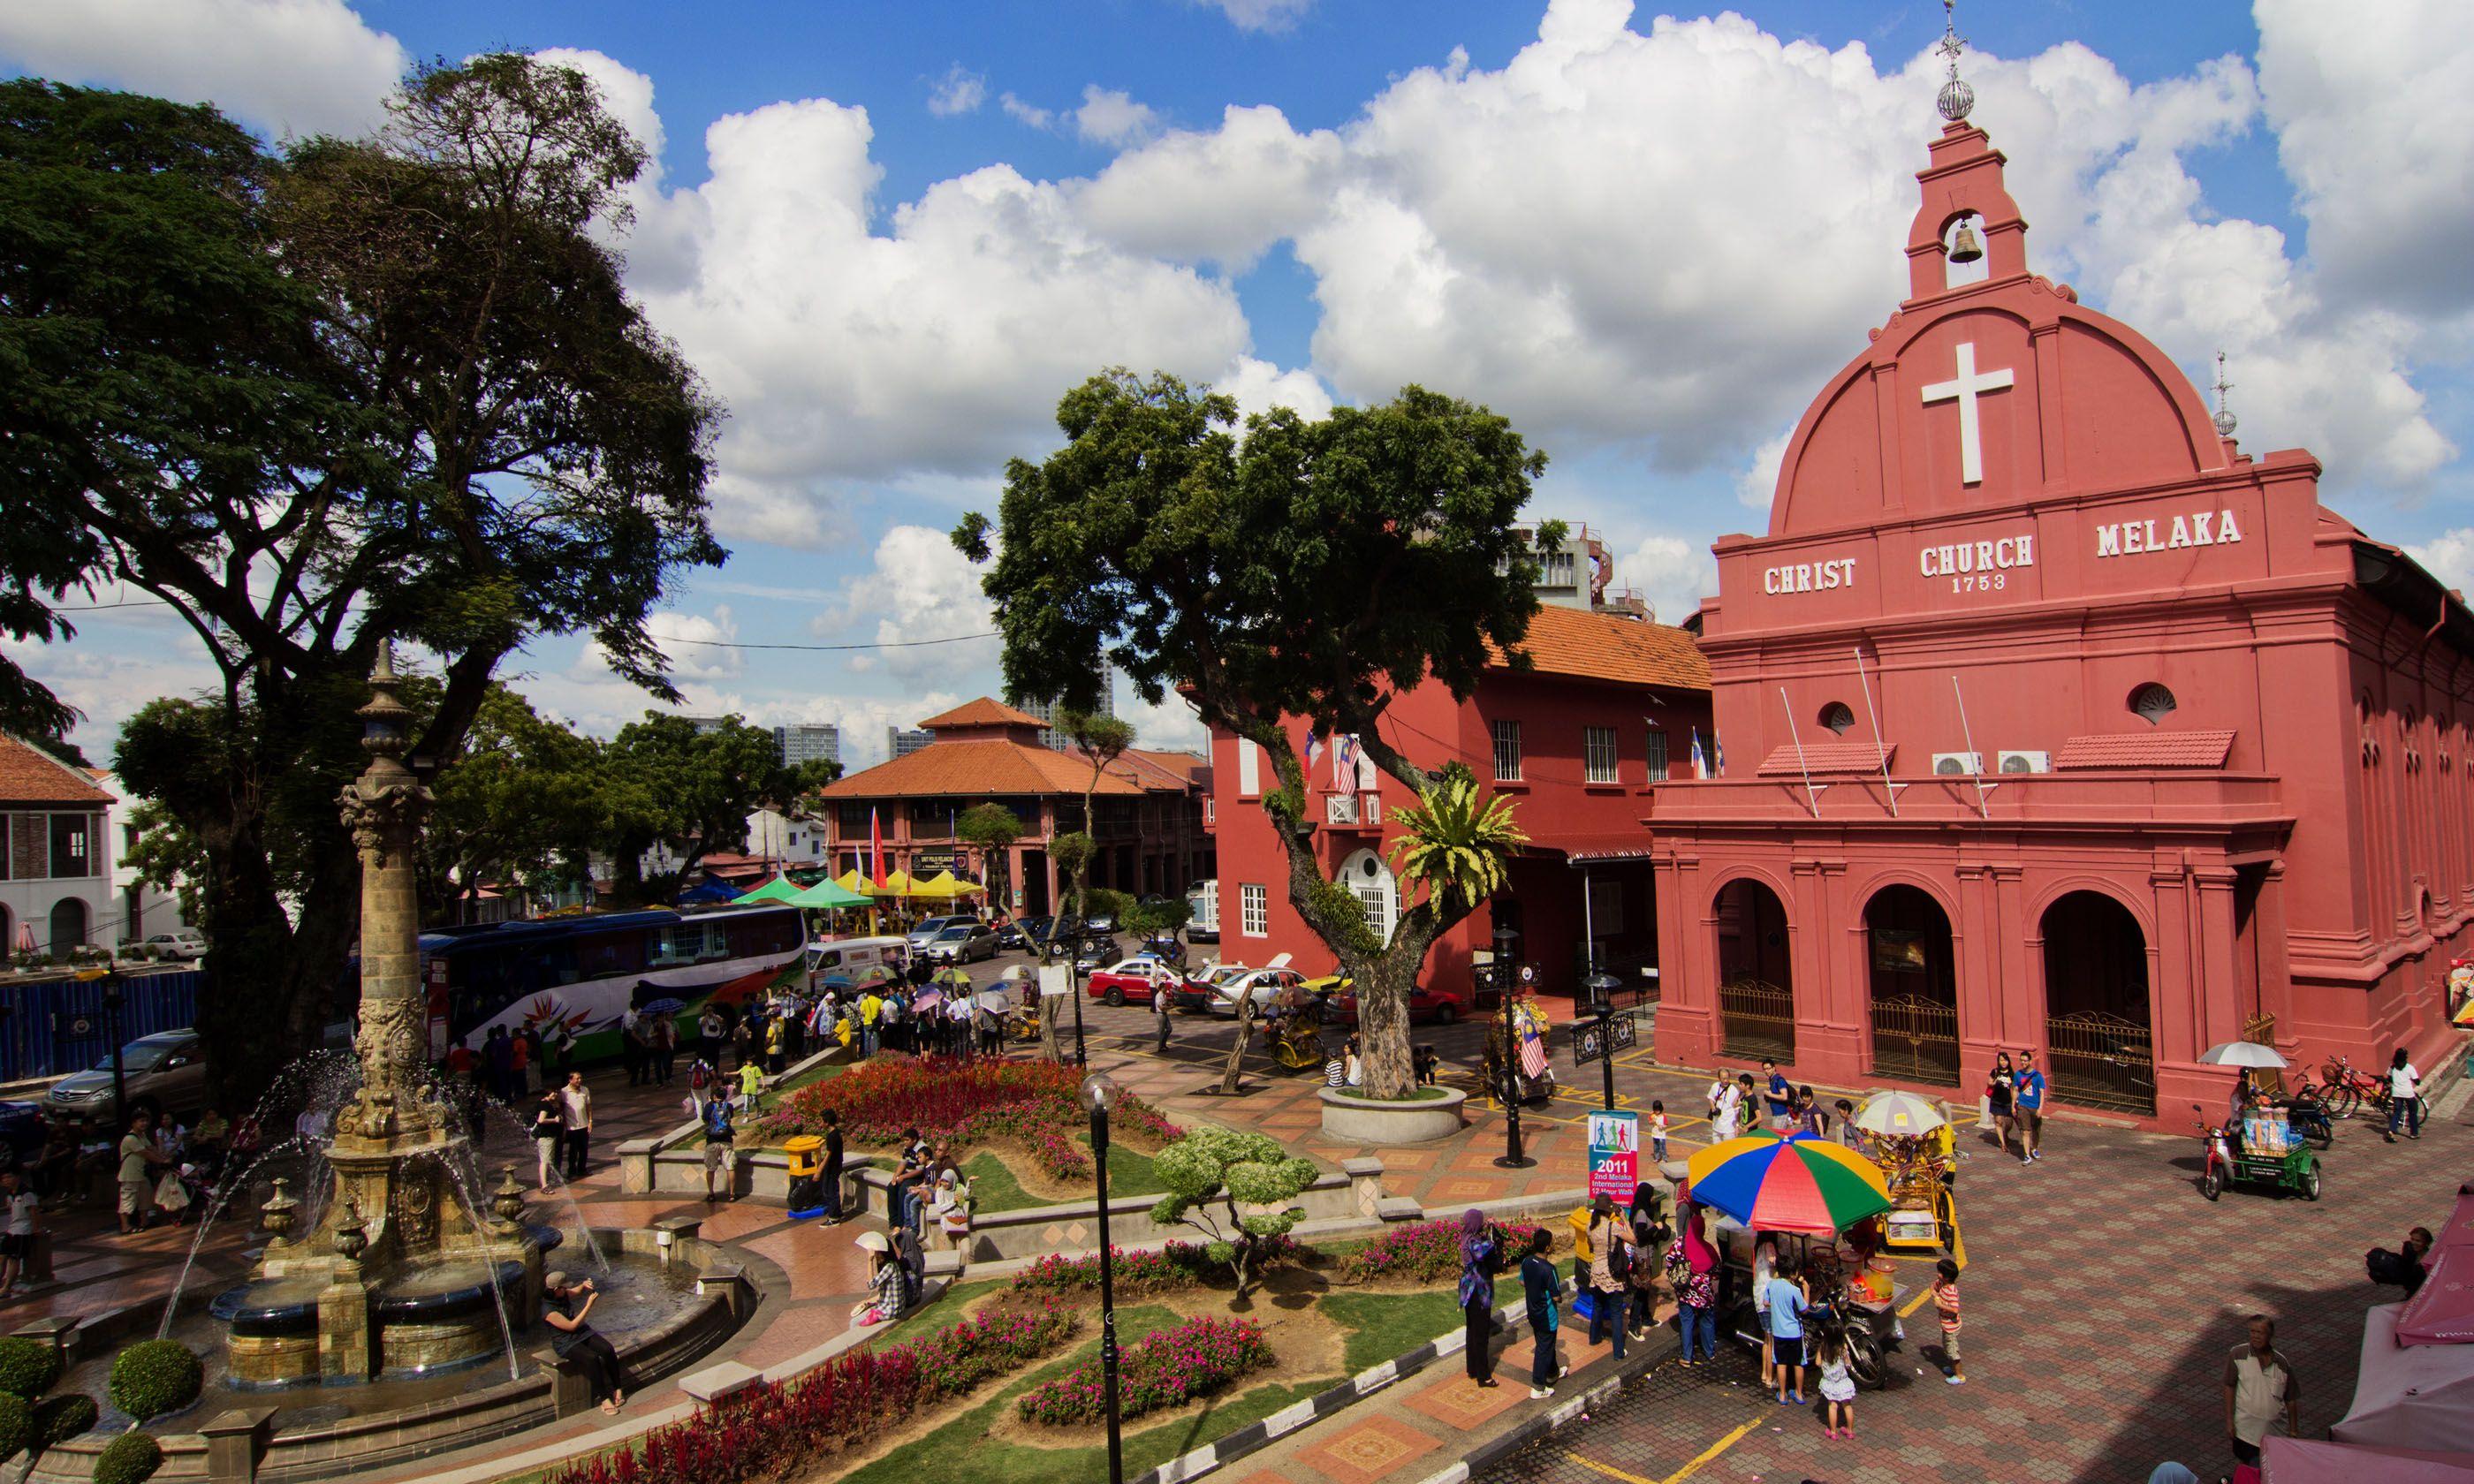 Malaka, Malaysia (Shutterstock.com)